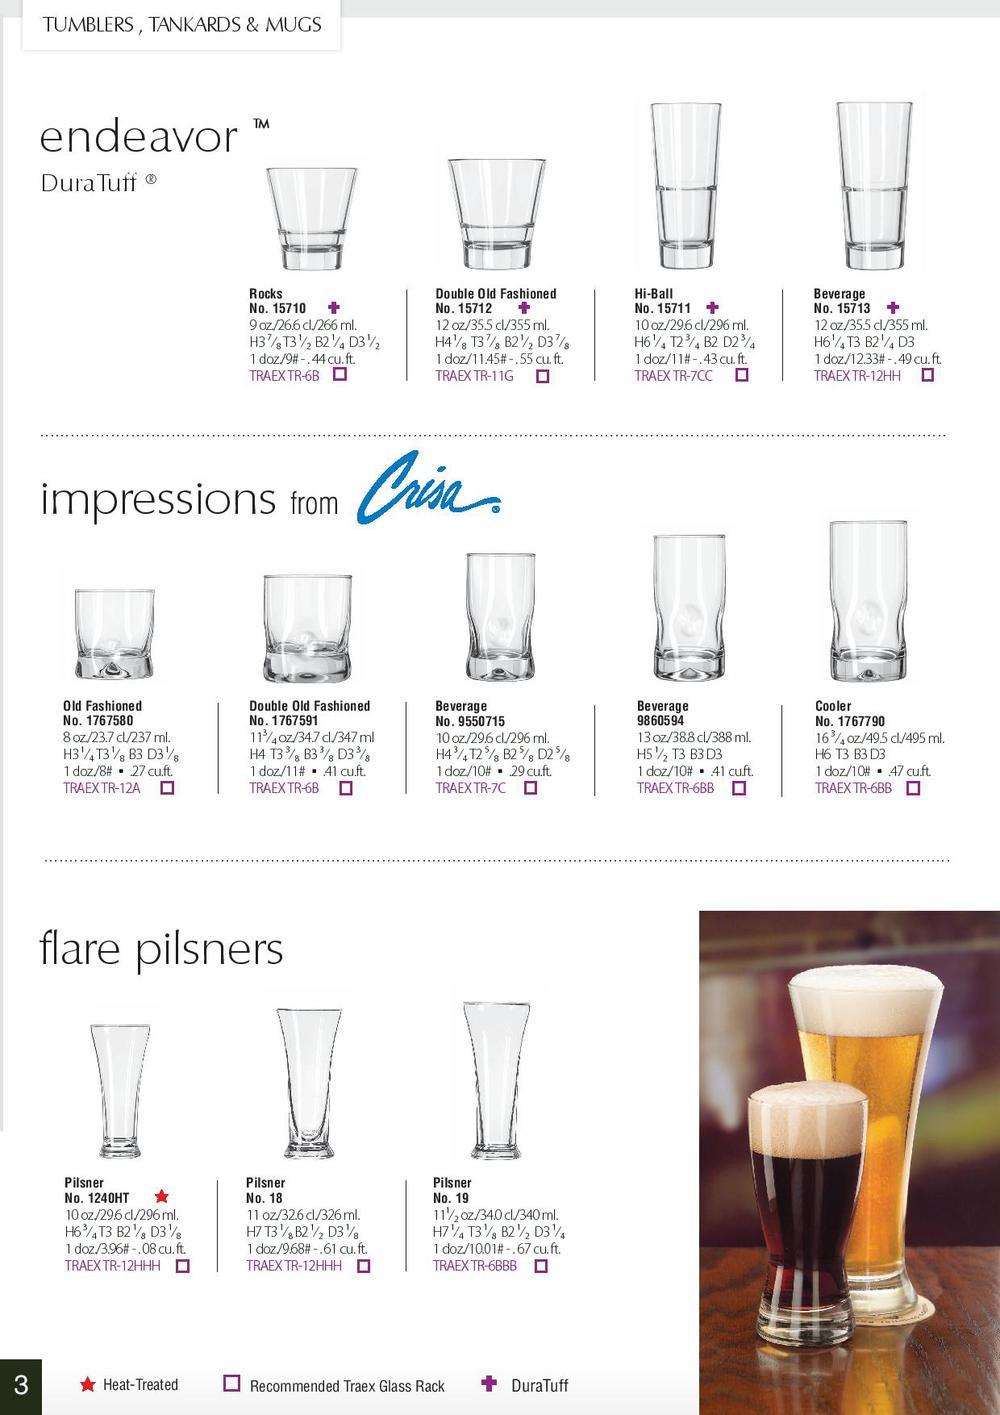 libbey local catalog - Libbey Glassware